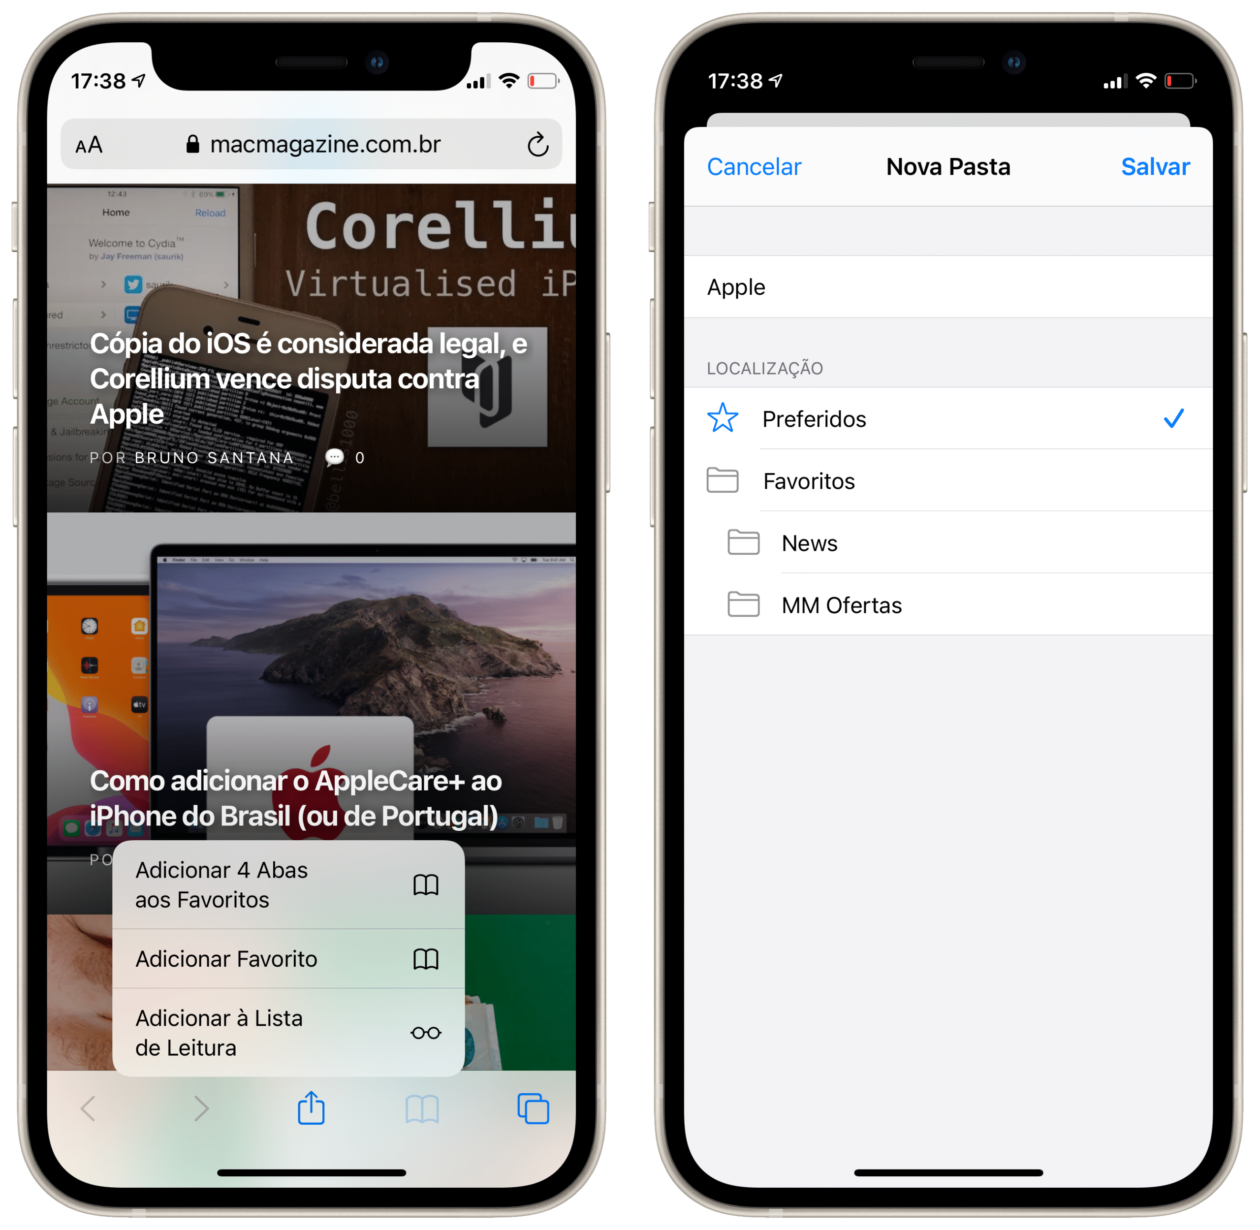 Adicionando múltiplas abas aos favoritos do Safari no iPhone